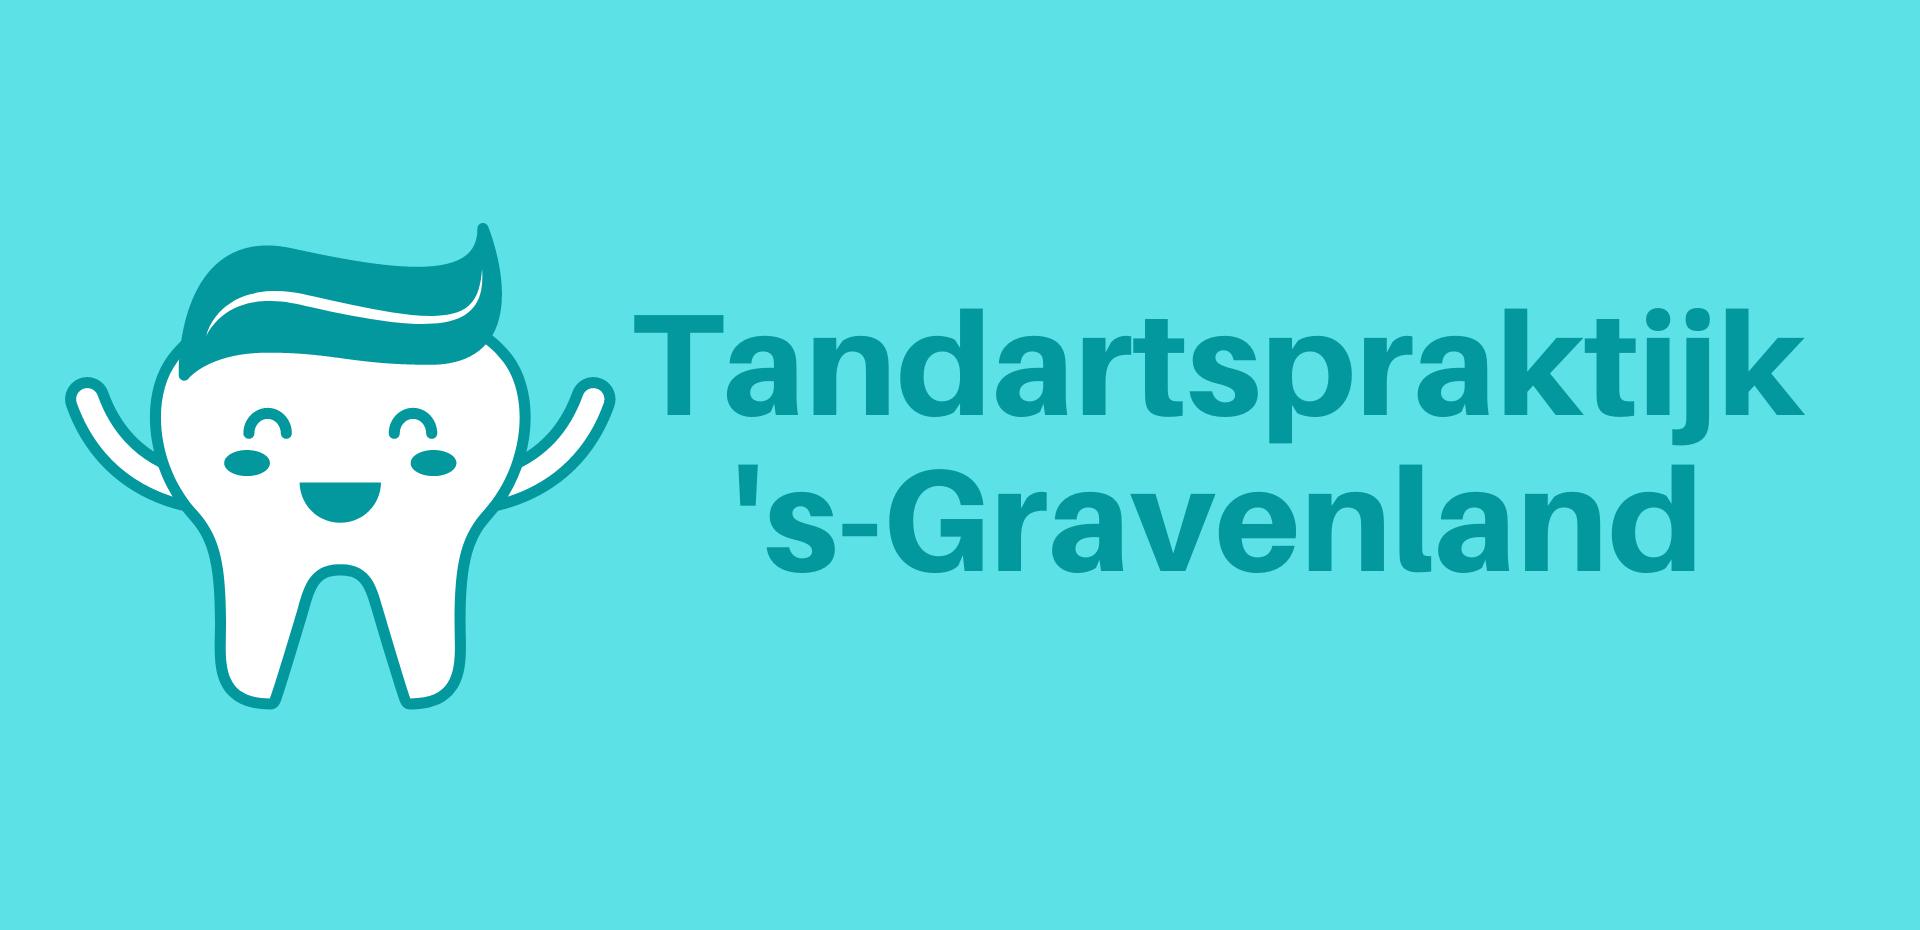 Tandartspraktijk 's-Gravenland